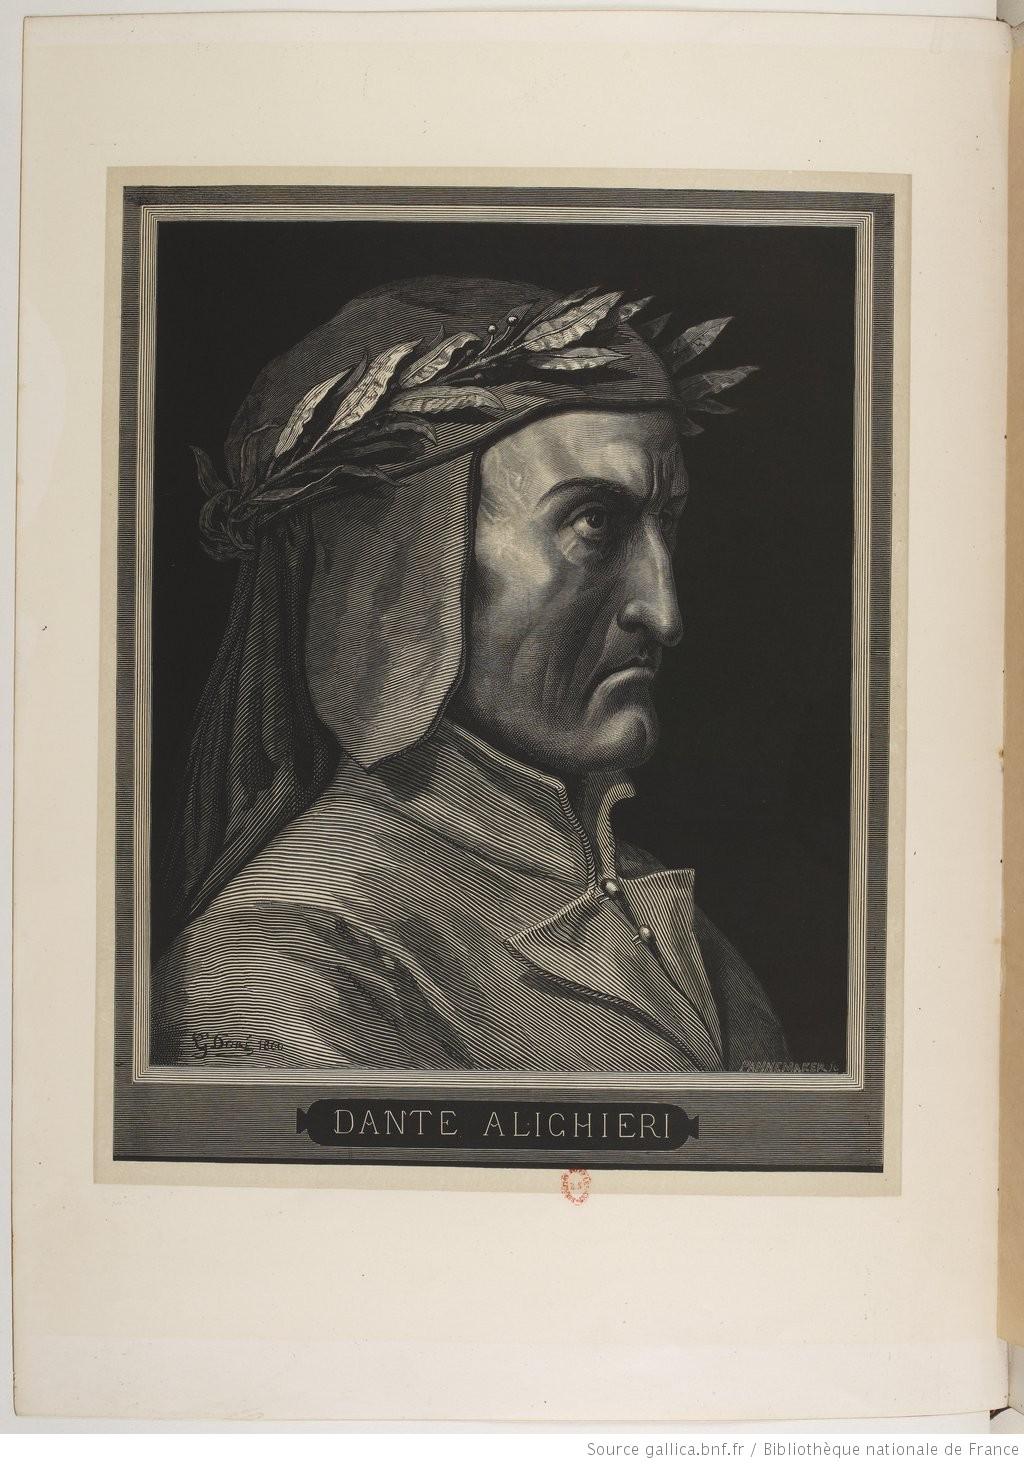 Dante Alighieri, https://gallica.bnf.fr/ark:/12148/bpt6k10448149/f10